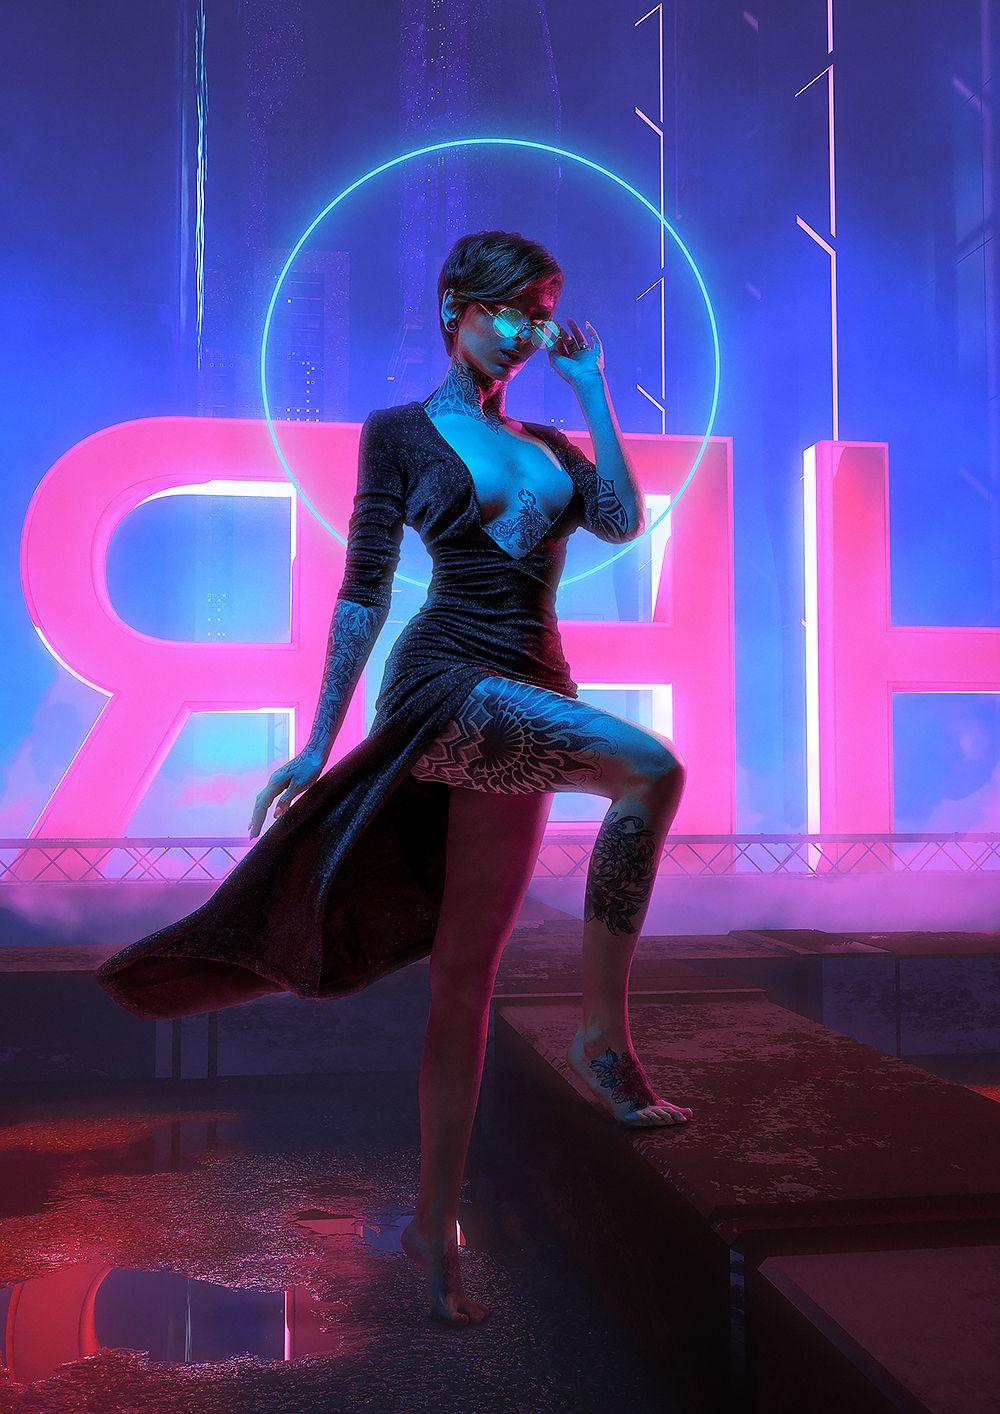 NEON WITCHES Calendar 2020 in 2020 Cyberpunk fashion